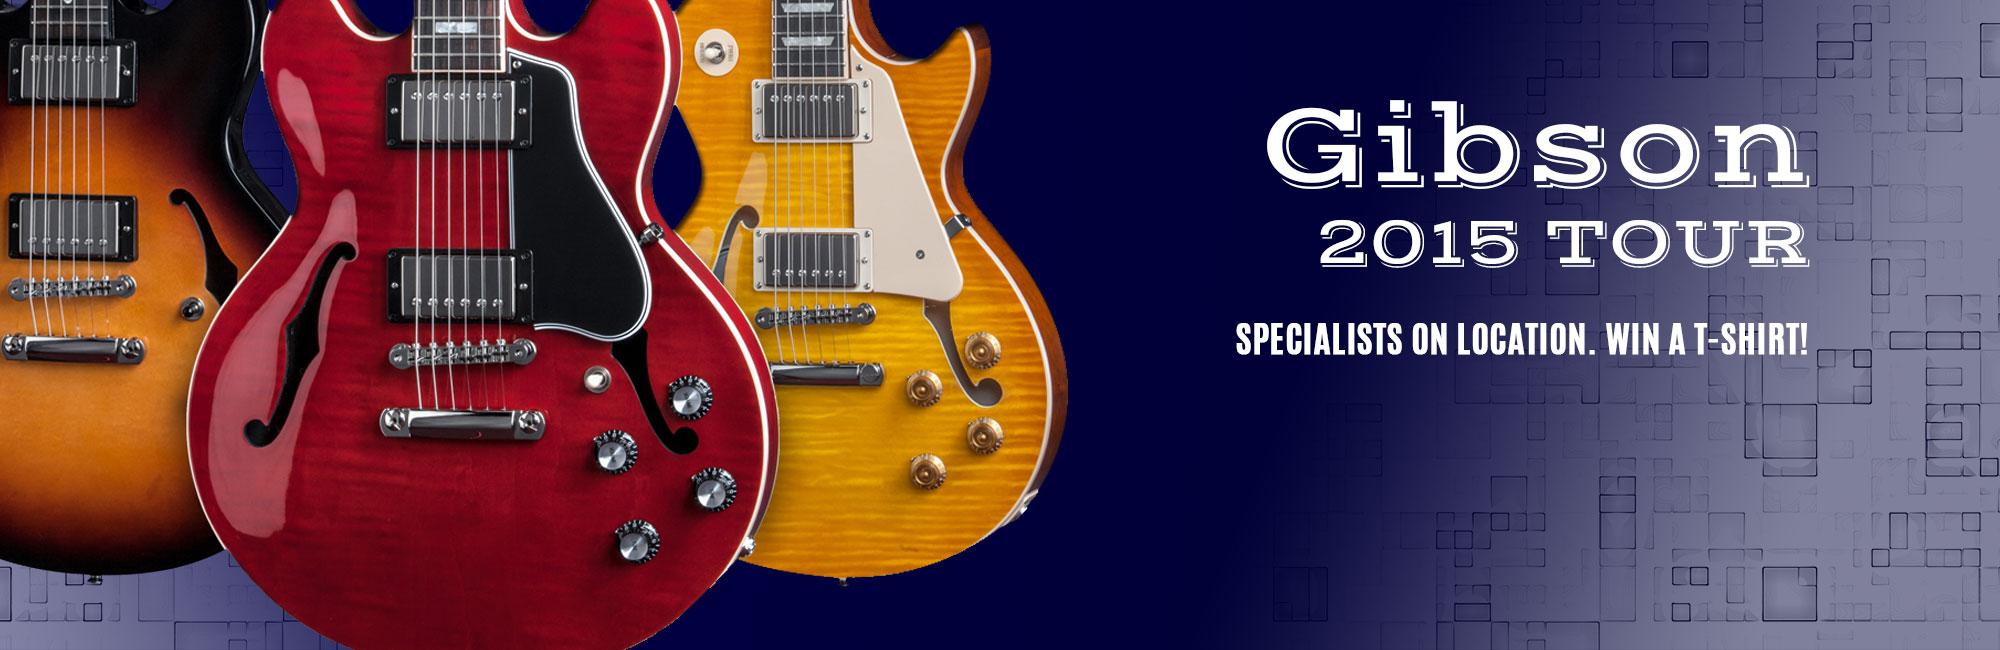 Gibson_2000x650